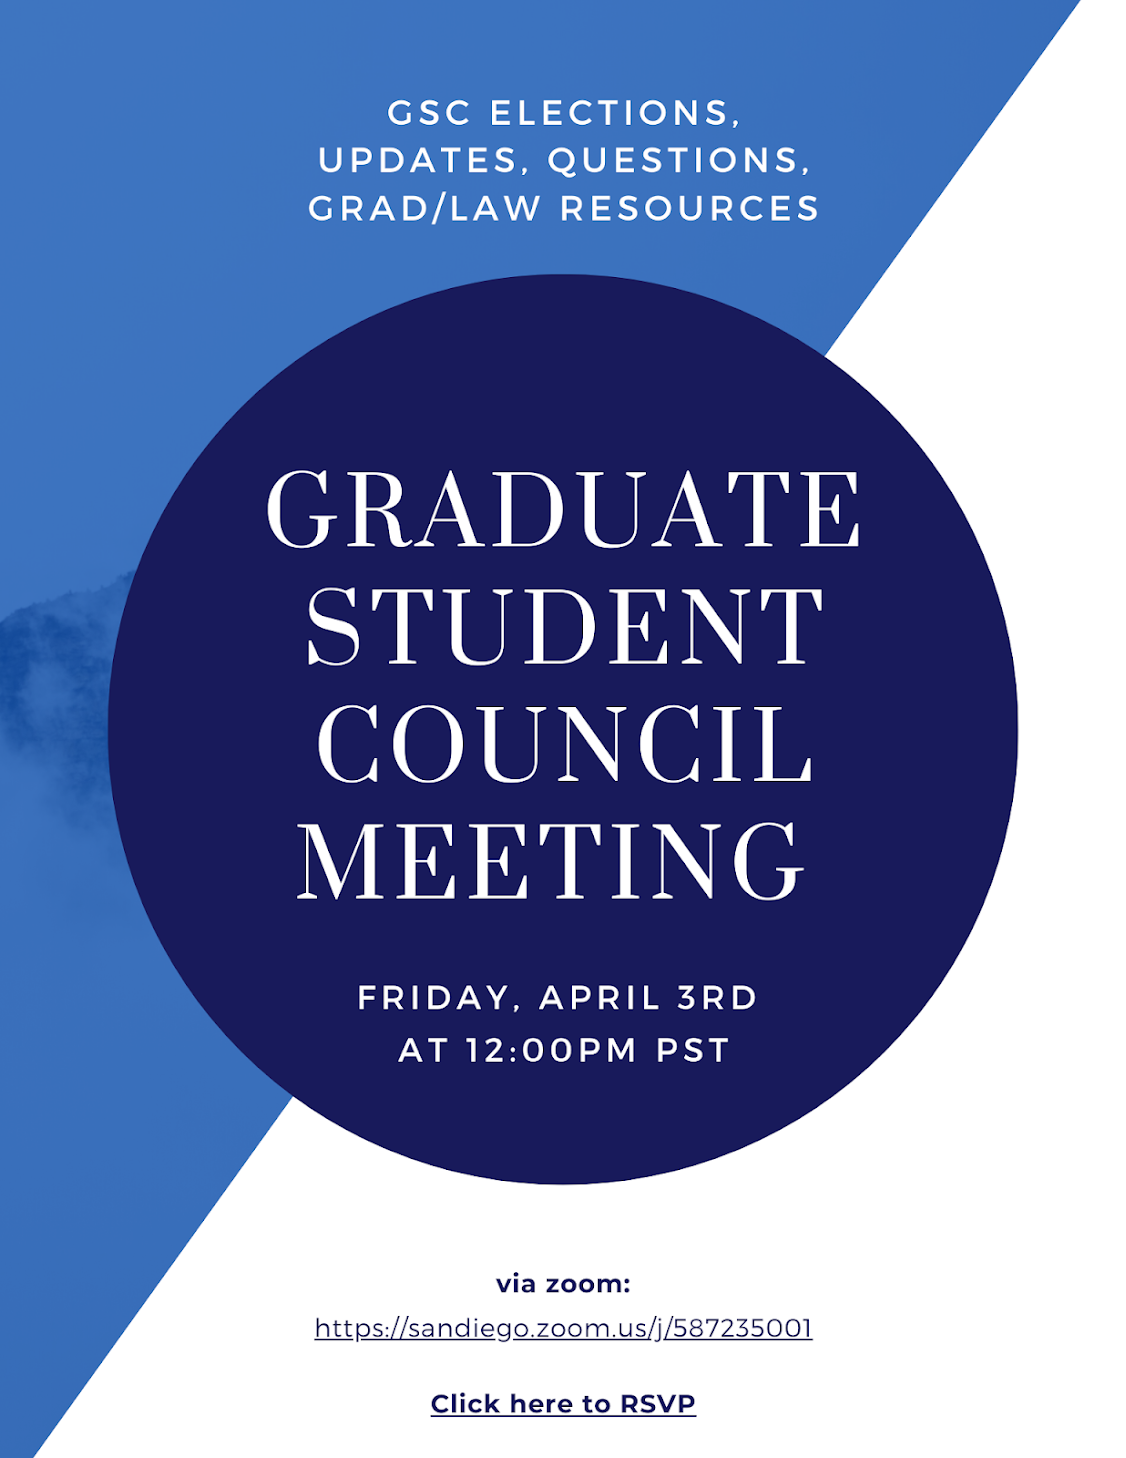 GSC Virtual Informational Meeting, Friday, April 3 at 12pm